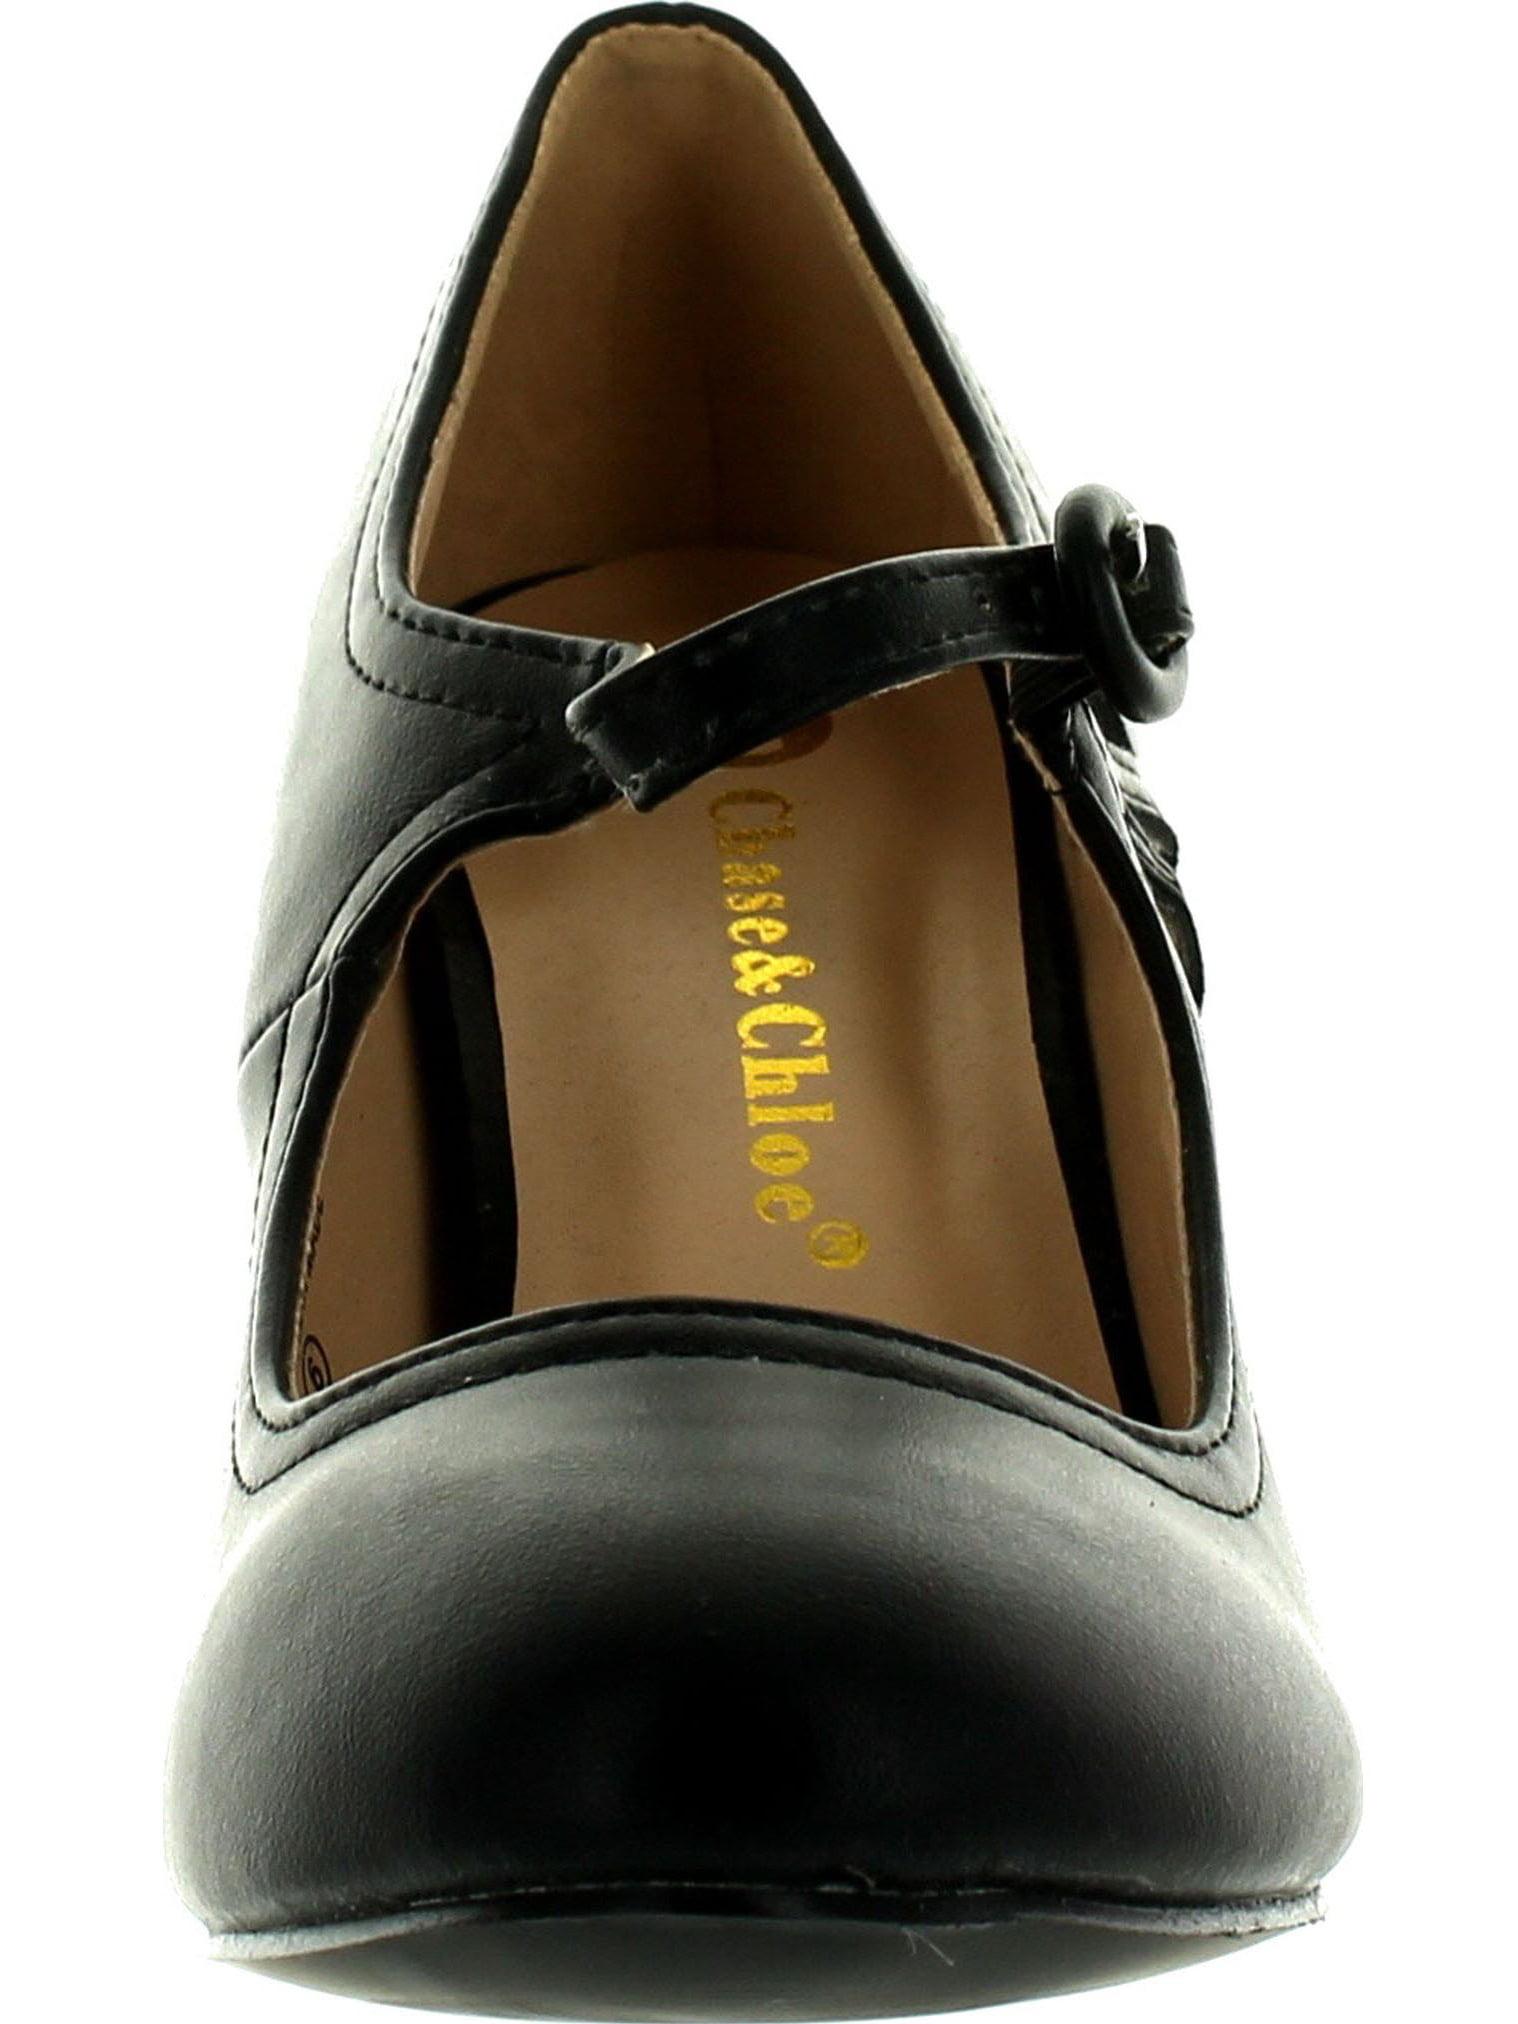 Chase & Chloe Kimmy-21 Women's Round Toe Pierced Style Mid Heel Mary Jane Style Pierced Dress Pumps 16a675